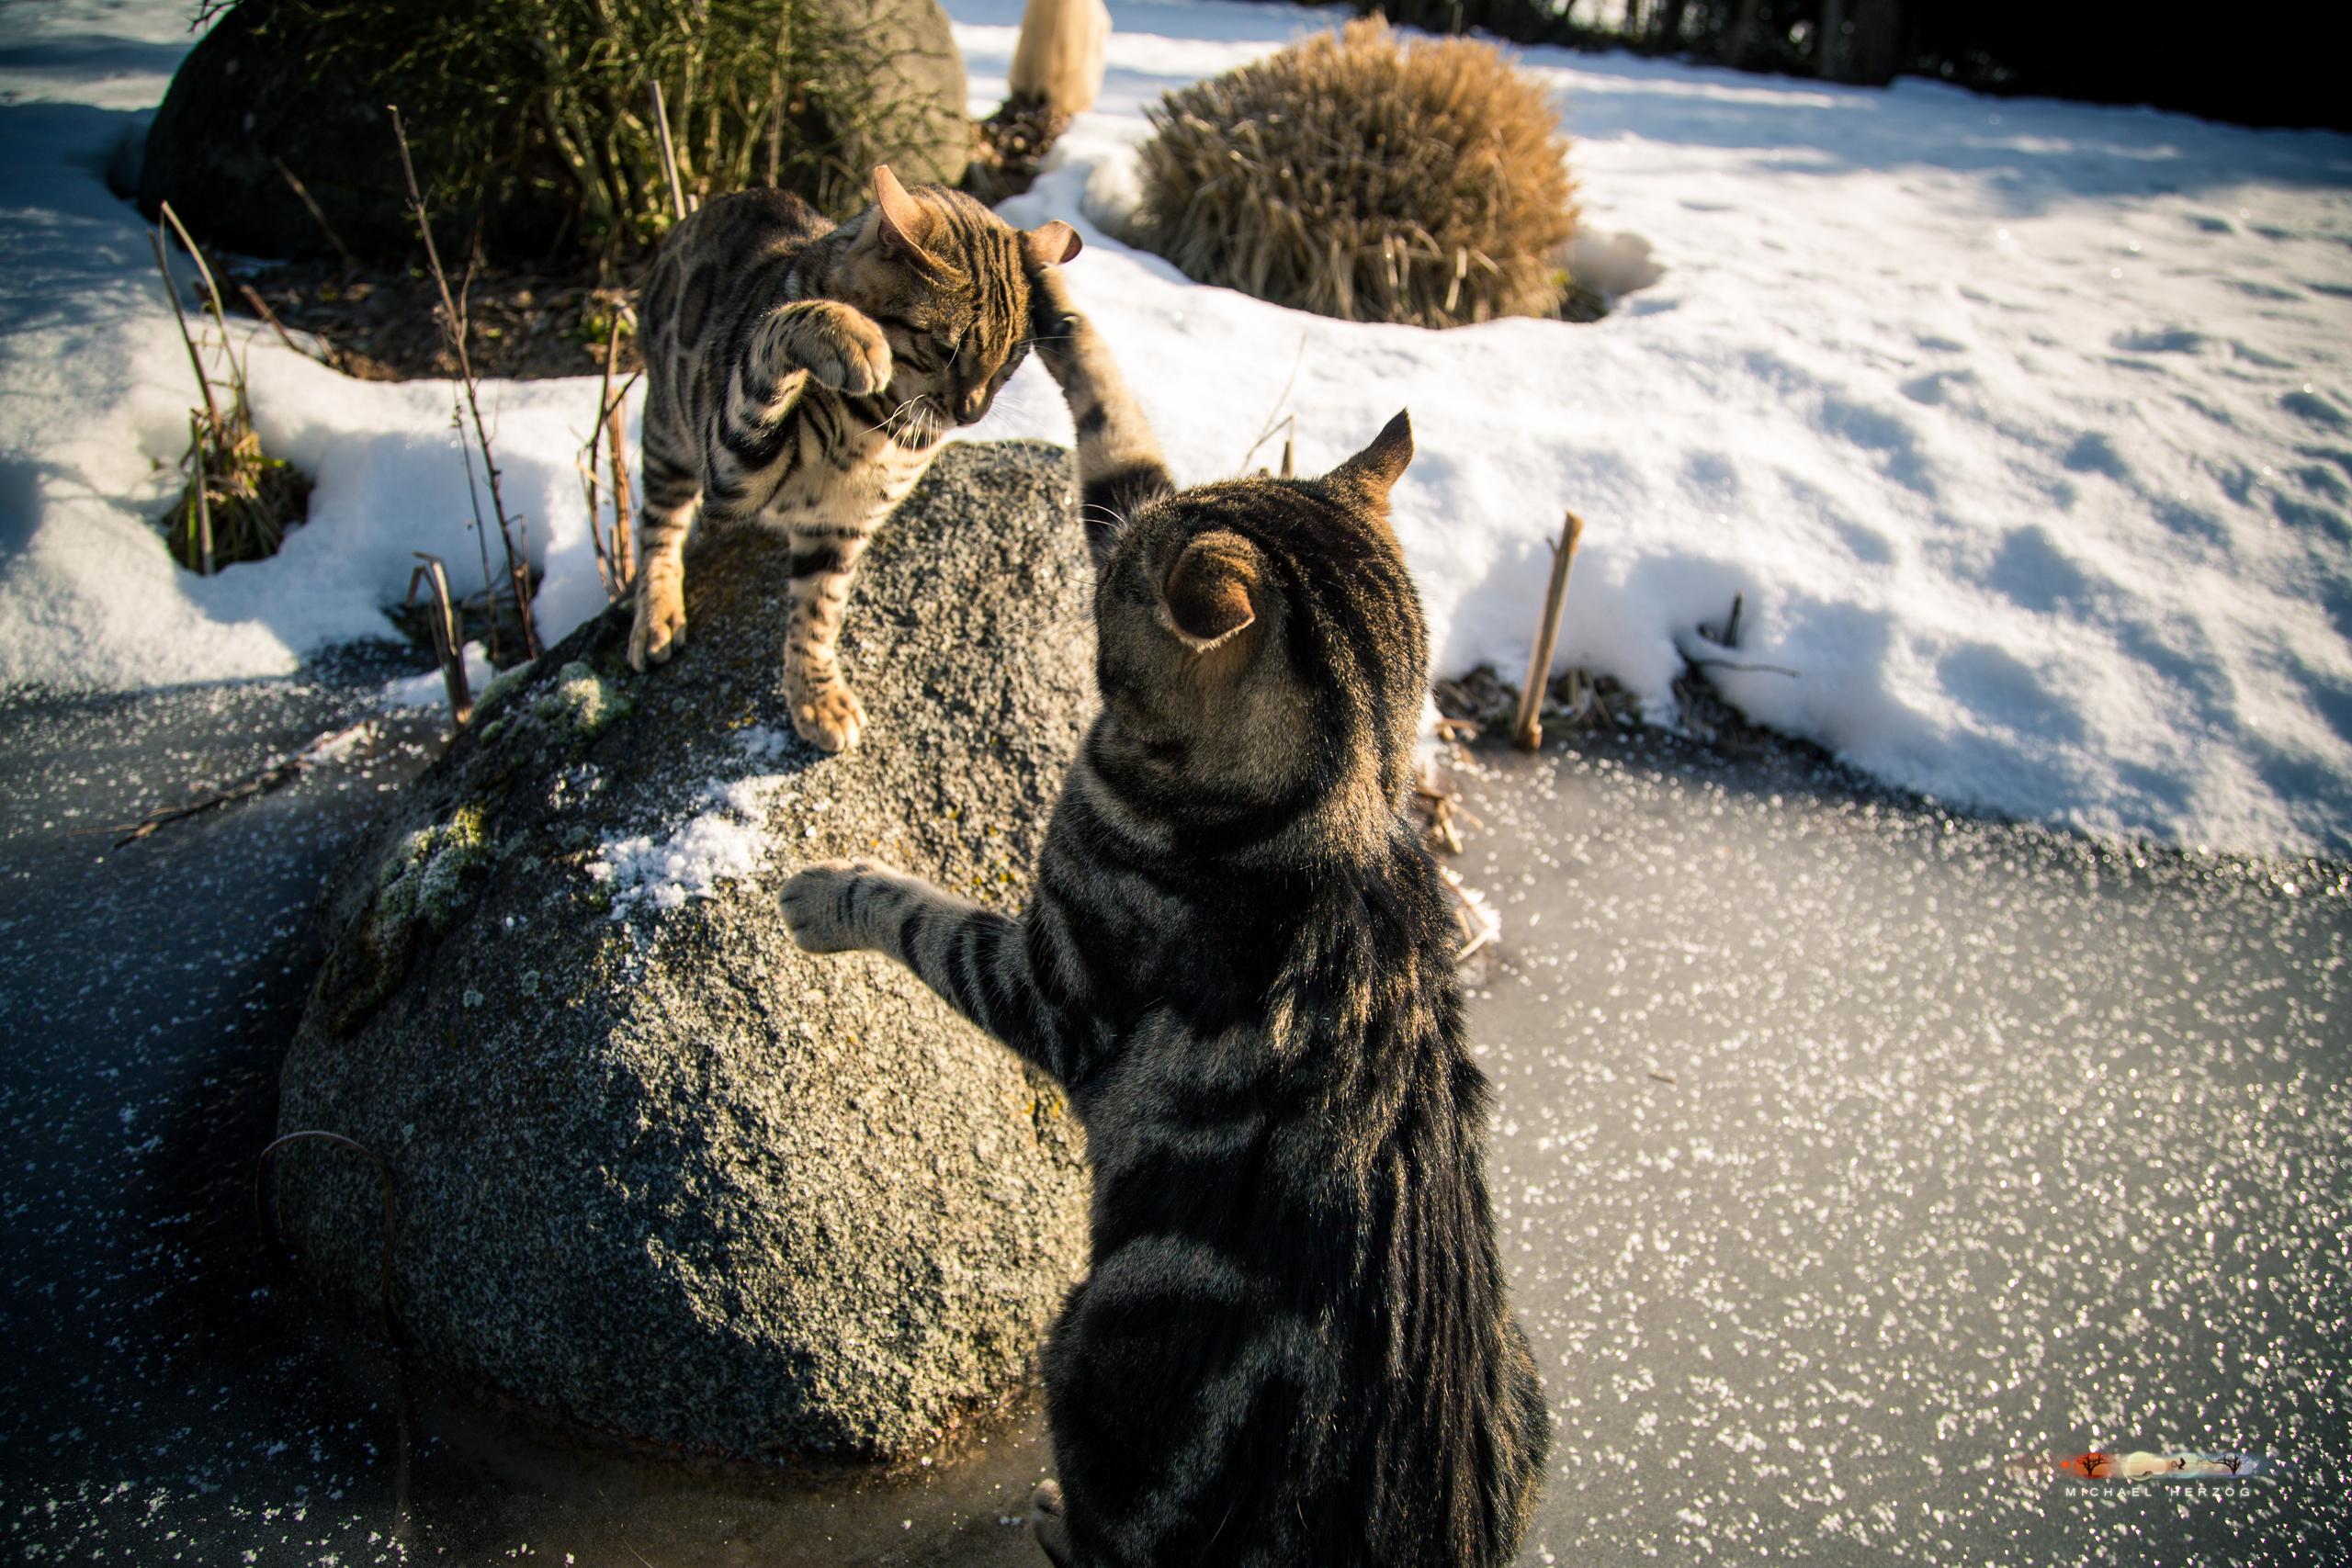 BALUARI_Winter2019_Garten_MichaelHerzog-8573.jpg